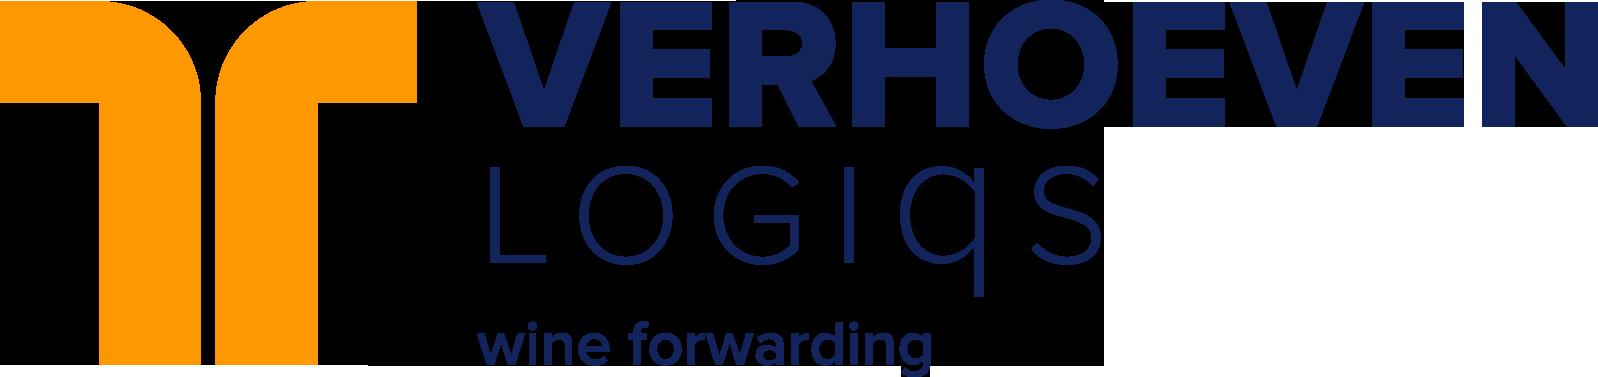 Verhoeven Logiqs logo